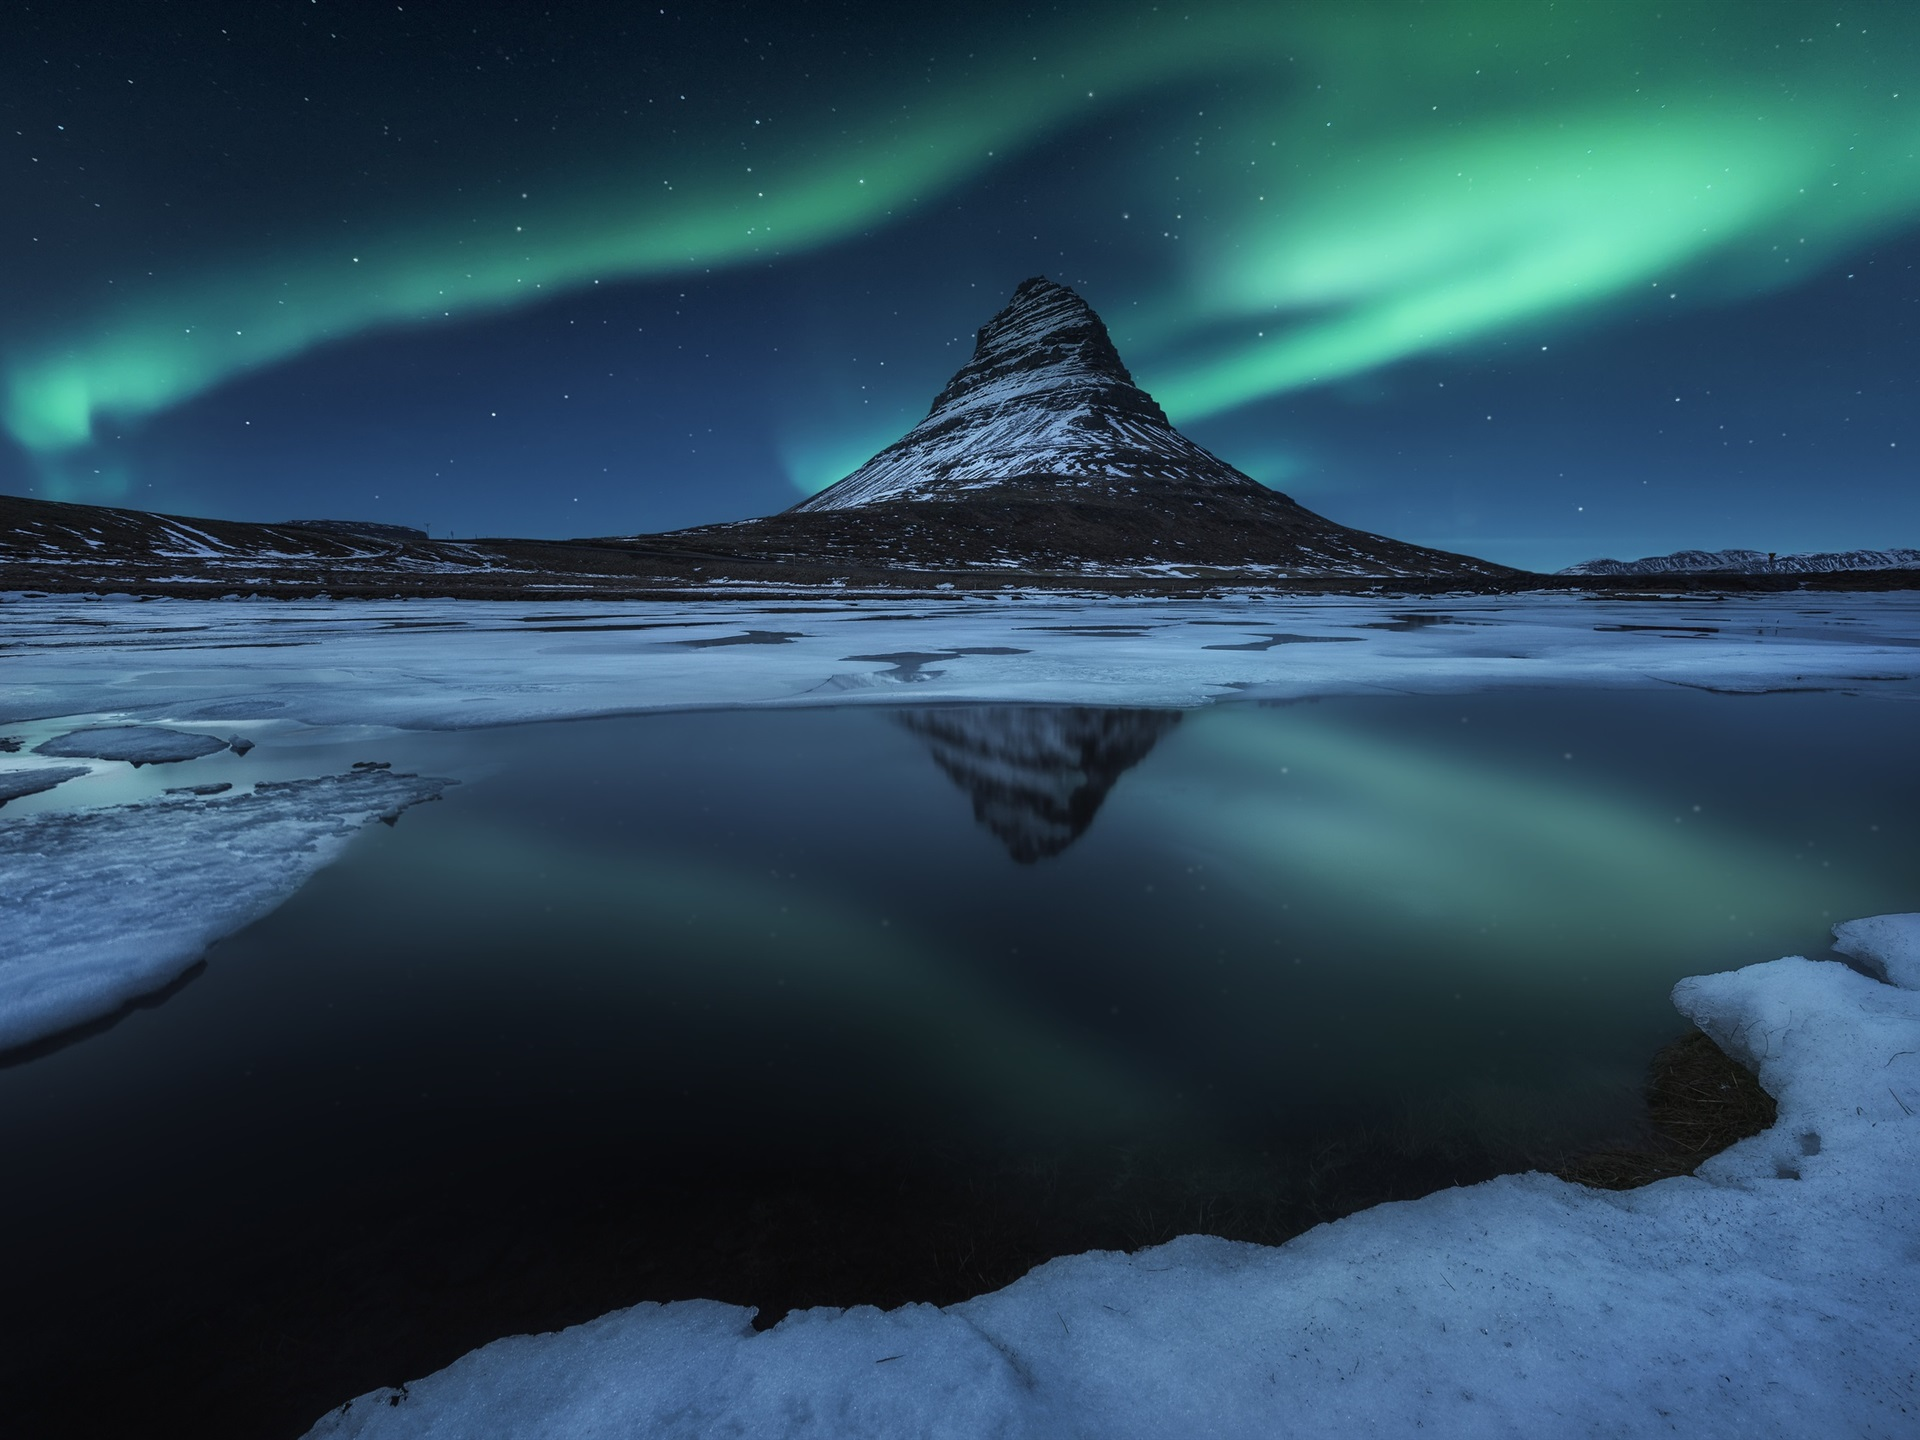 Wallpaper Iceland Kirkjufell Mountain Snow Night Northern Lights